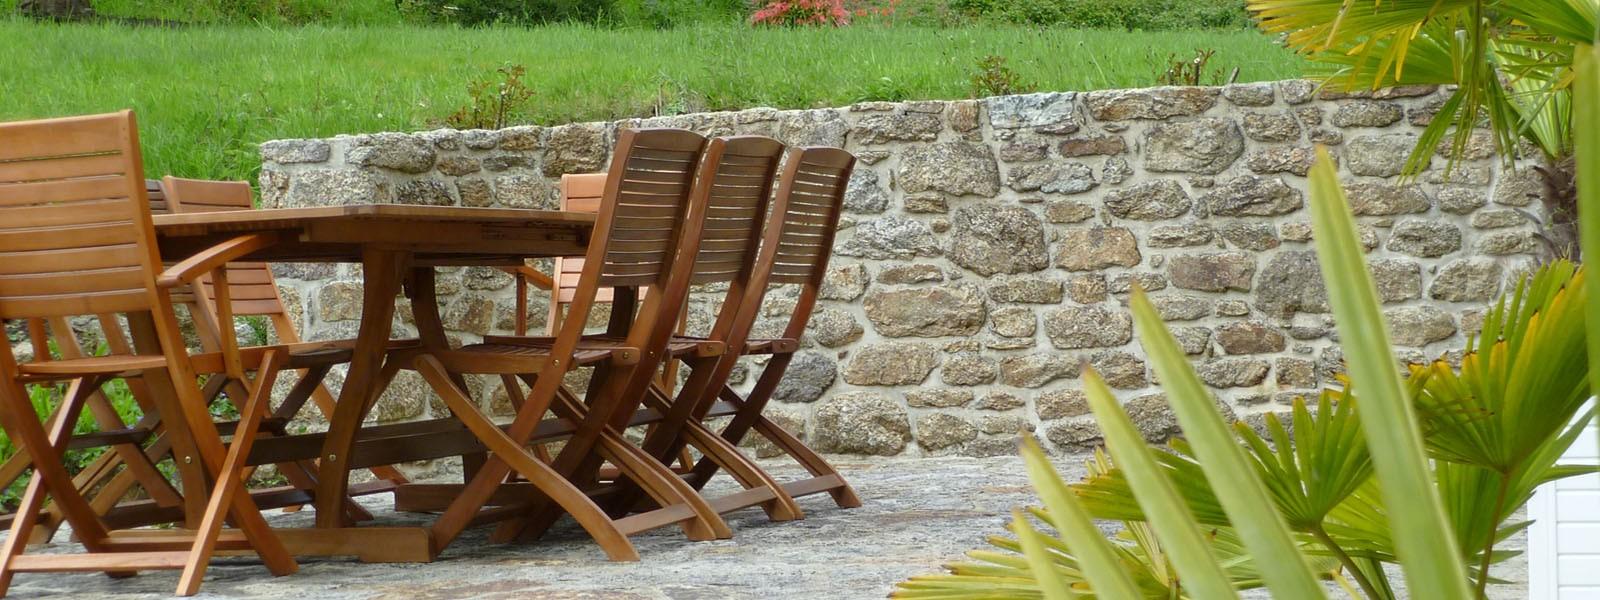 Terrasse La Bergerie - Locations Vacances Bretagne